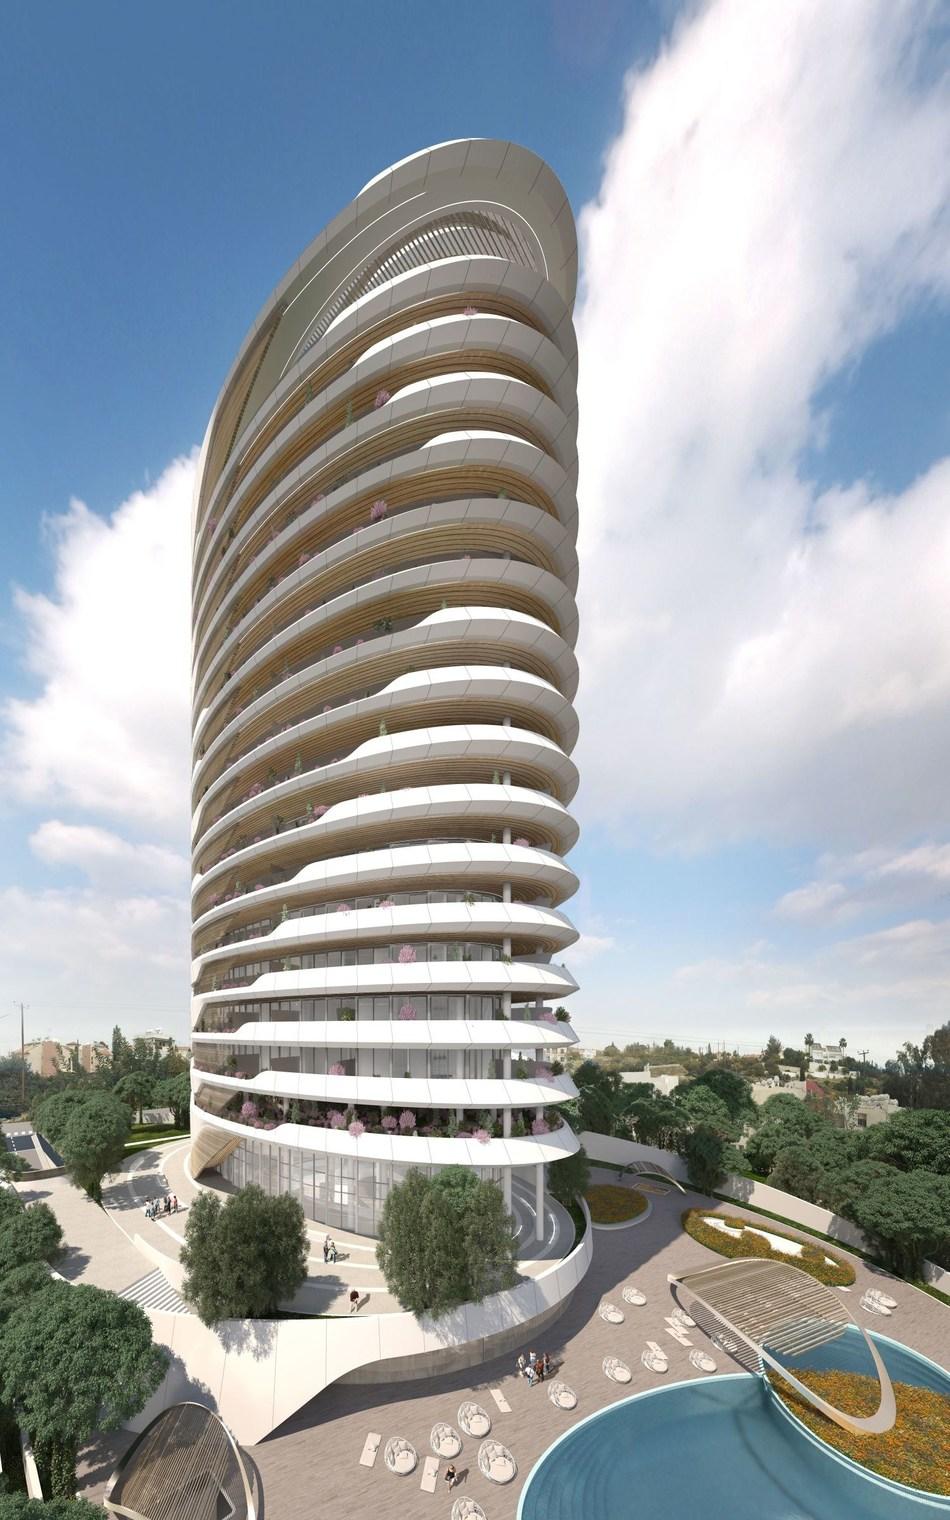 Sixty6 Tower by Pininfarina in Limassol, Cyprus, 17-floors residential tower designed by Pininfarina for Nikhi Group (PRNewsfoto/Pininfarina SPA)